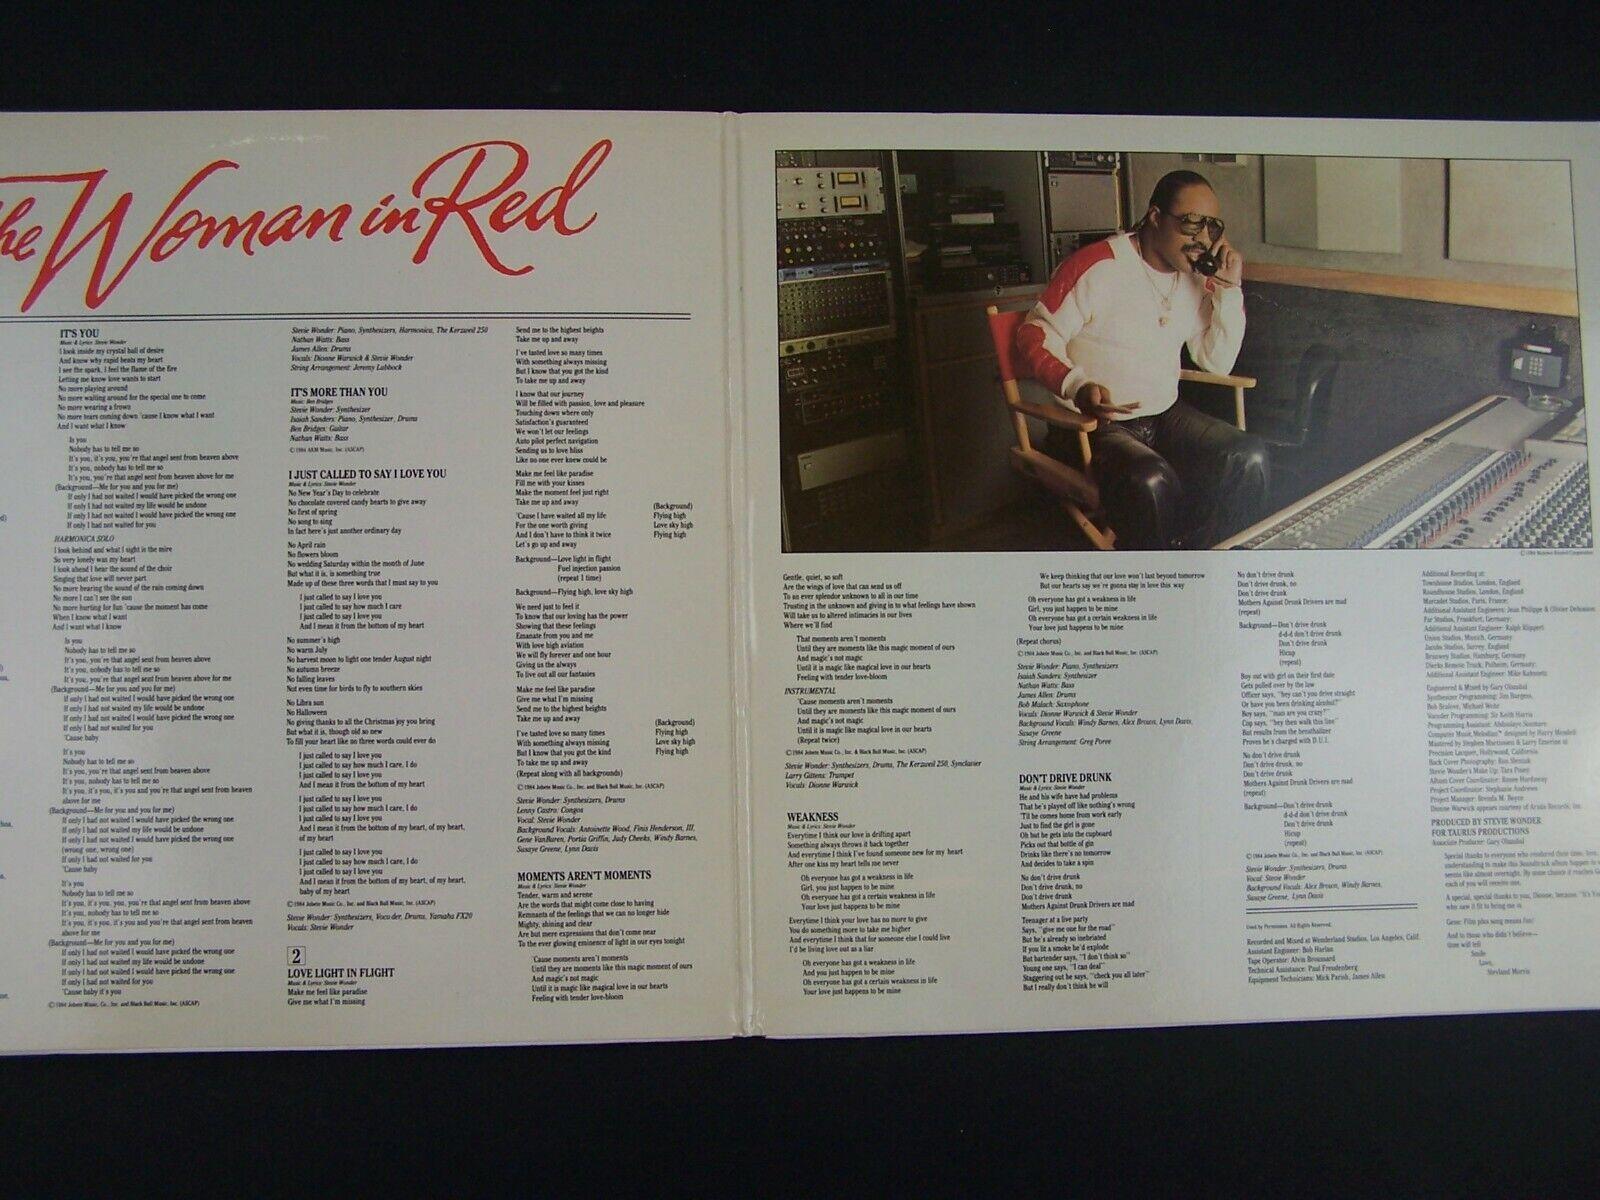 Stevie Wonder - The Woman In Red Original Soundtrack Vi